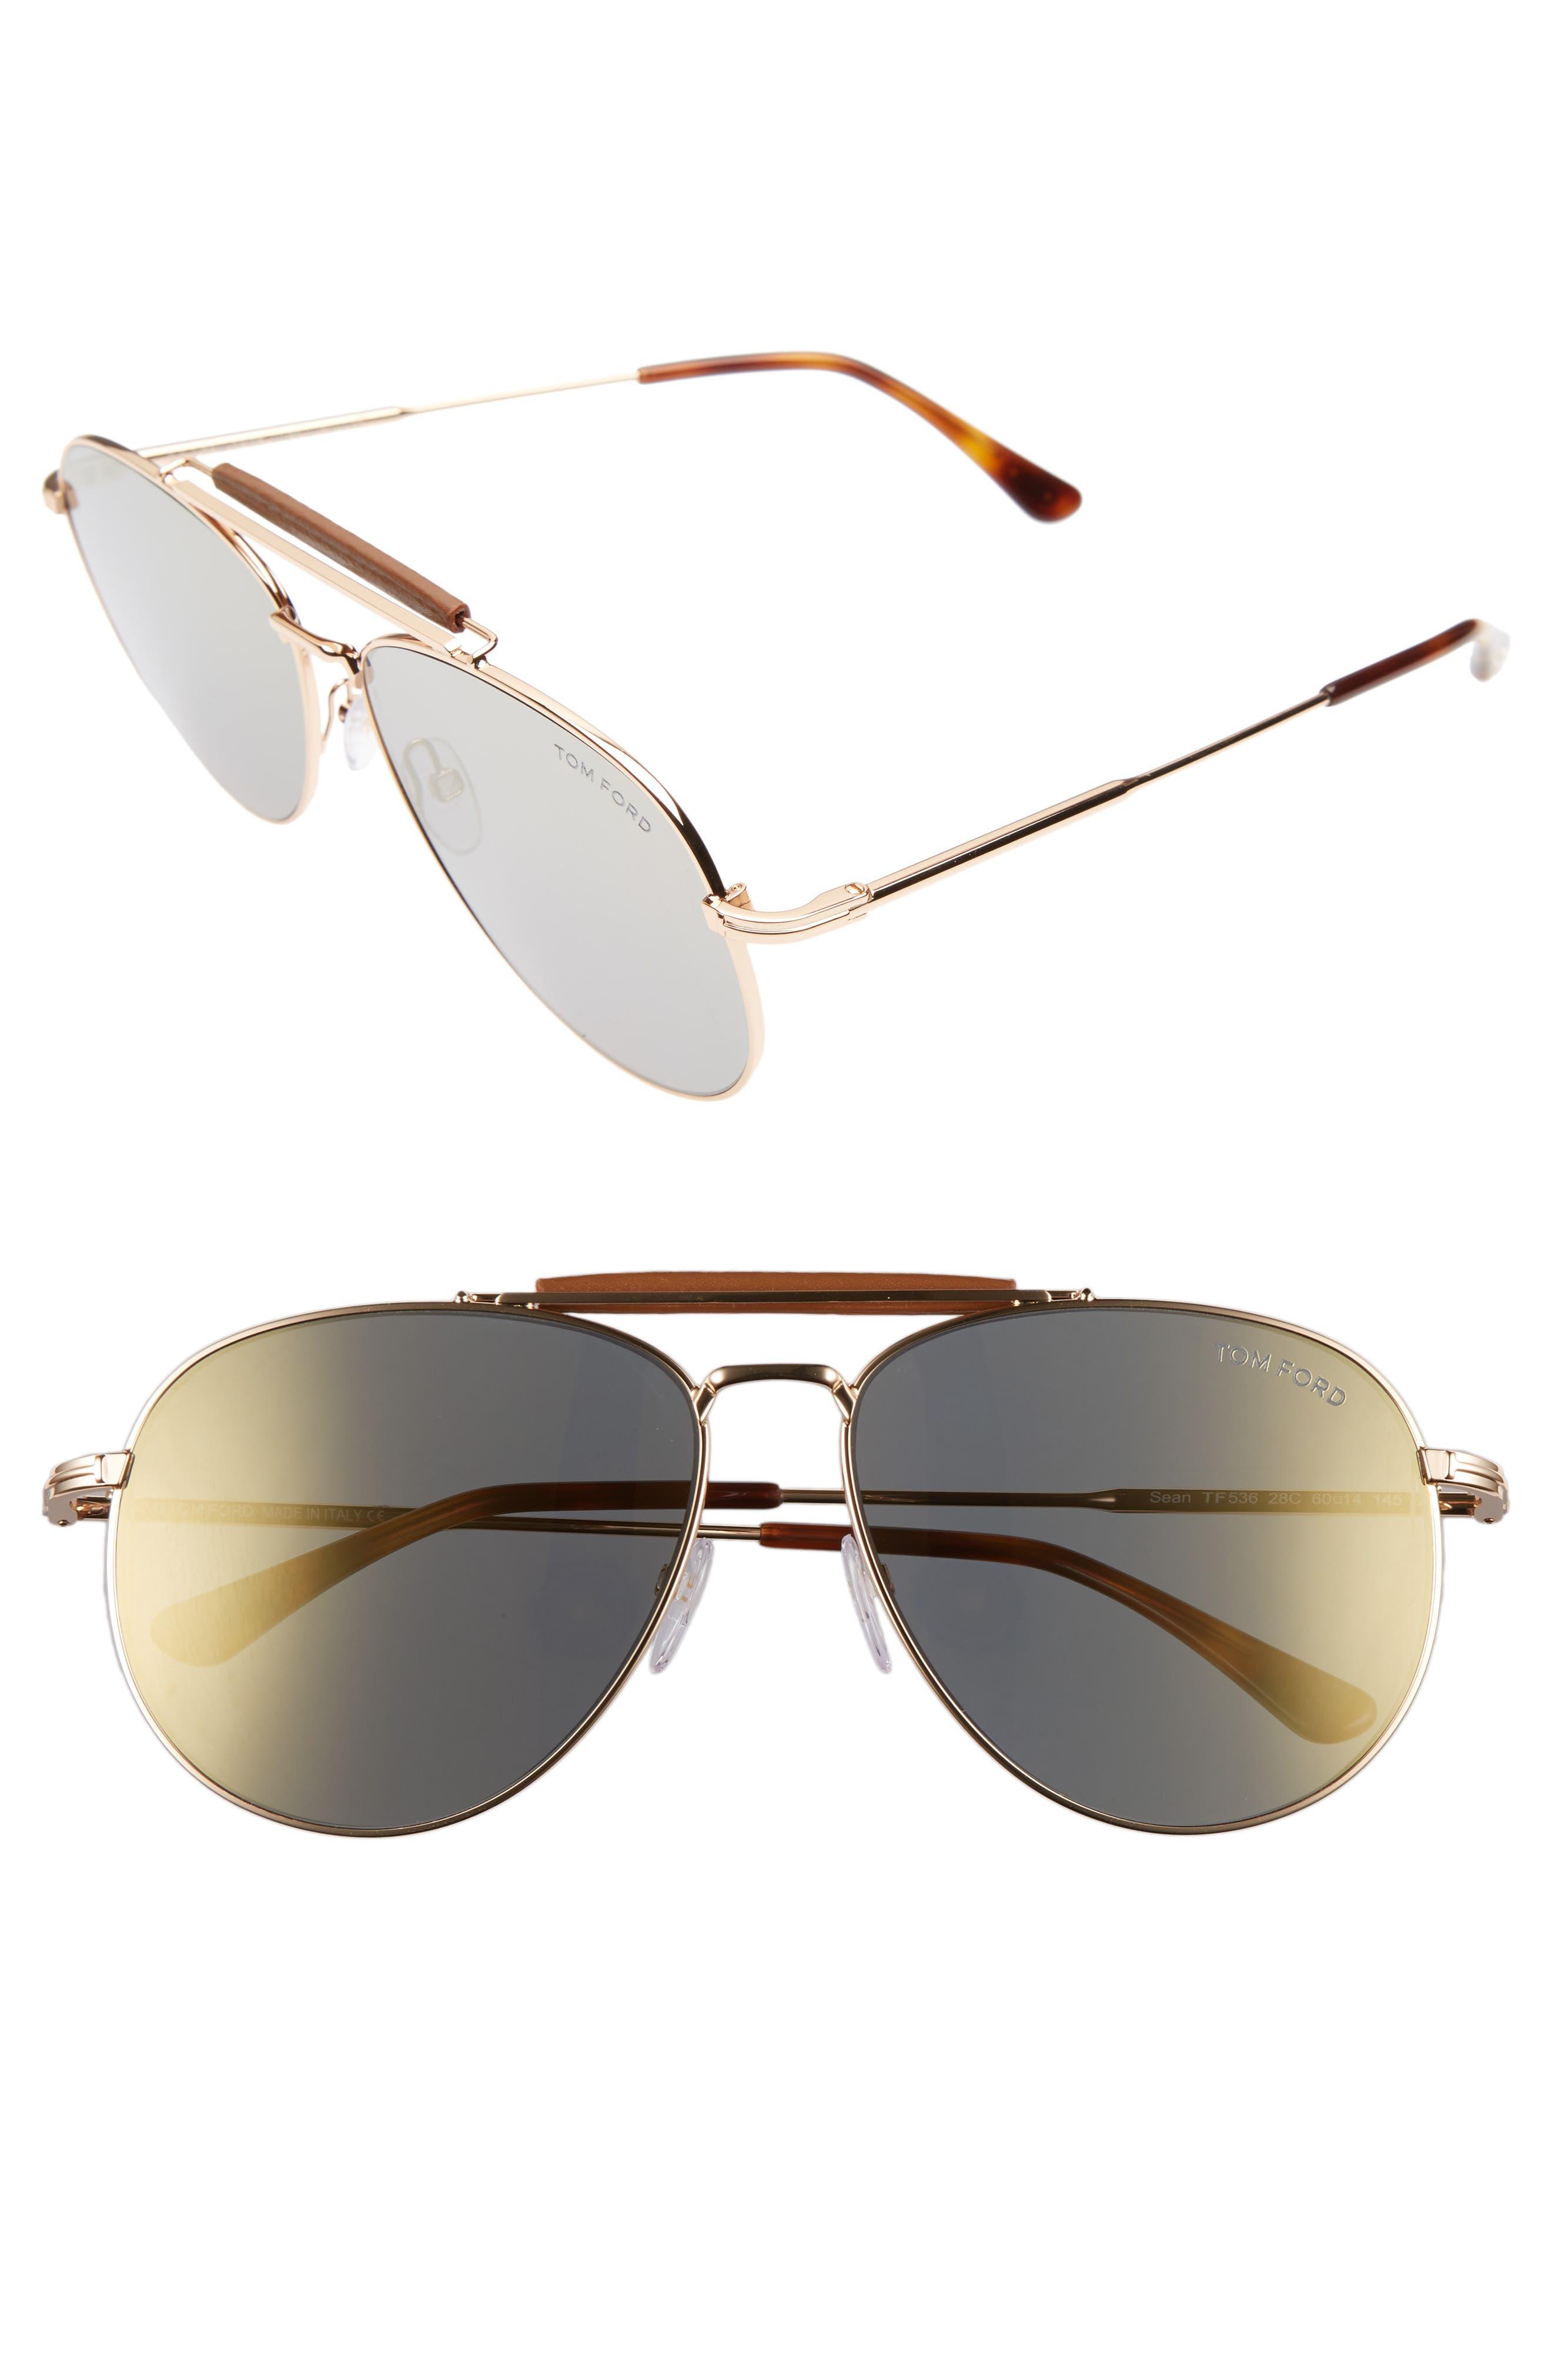 Tom Ford Sean 60mm Aviator Sunglasses